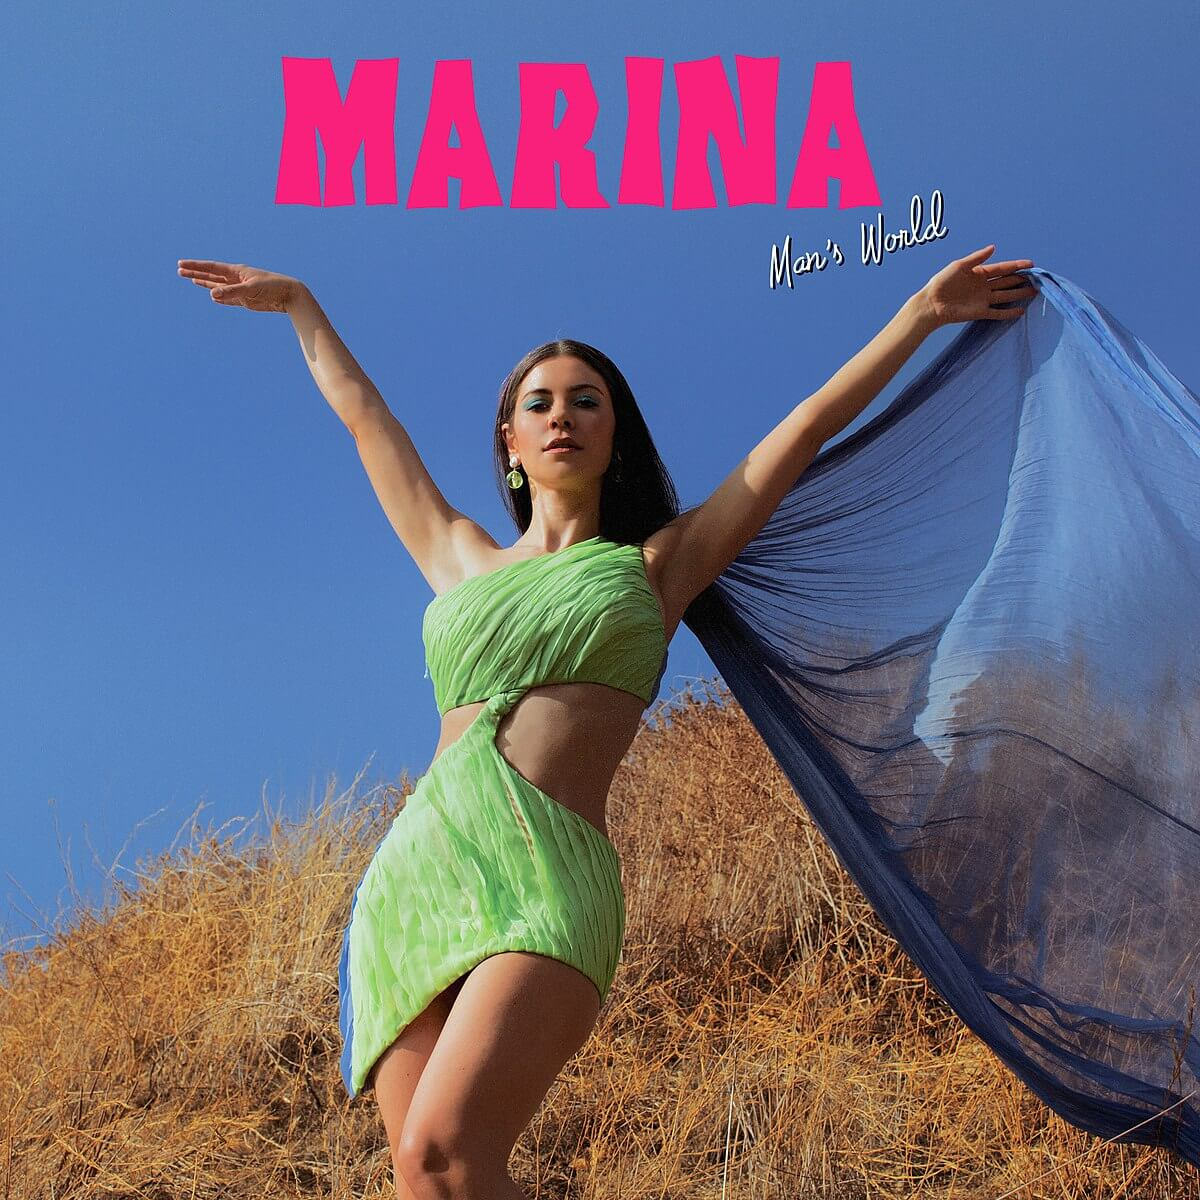 MARINA - Man's World Lyrics